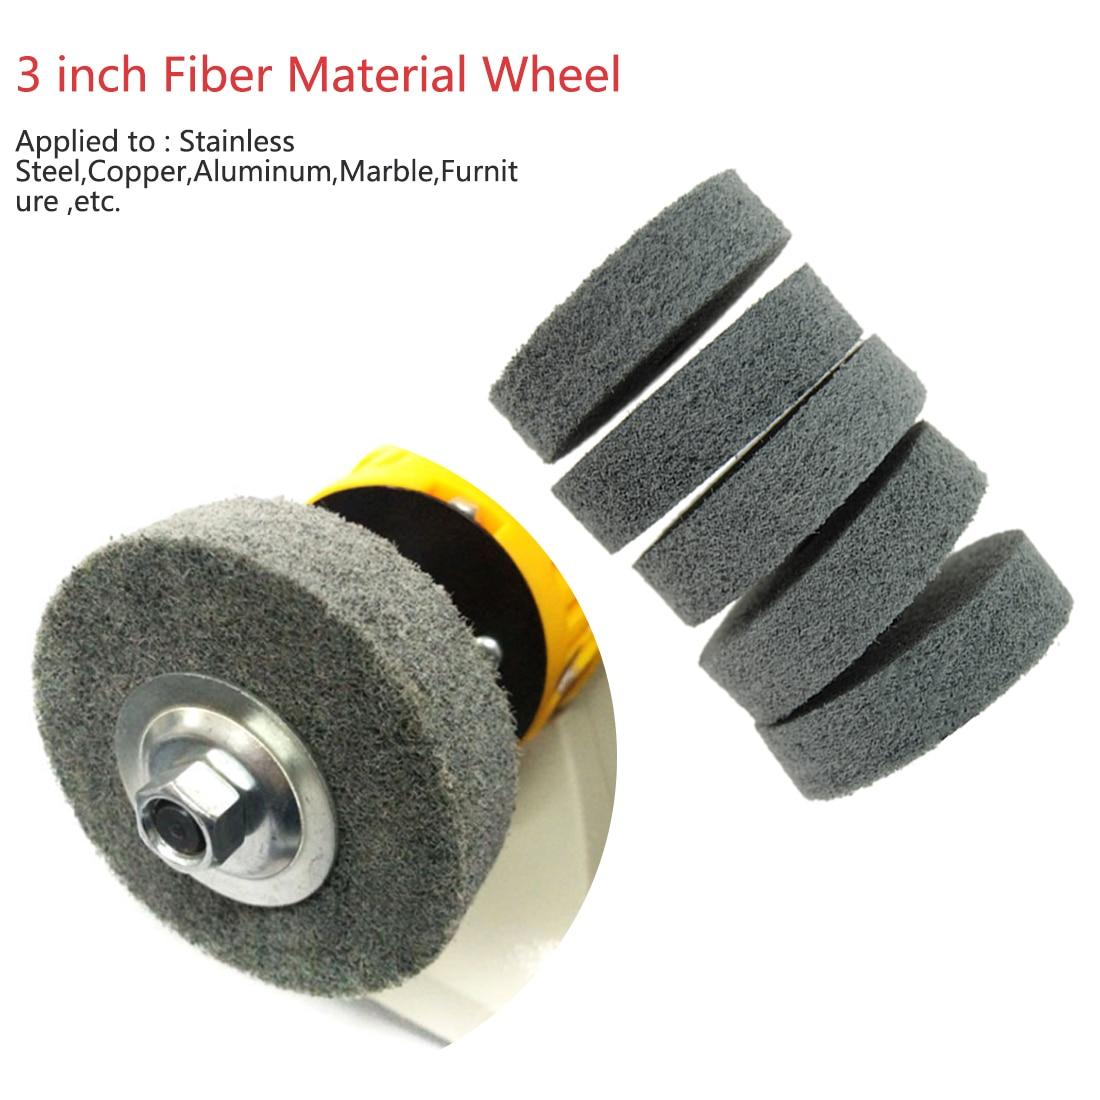 Original Imported Iron Instrument Grinding And Polishing 75*19*10mm Nylon Wheel Fiber Wheel Suitable For Dremel Tools